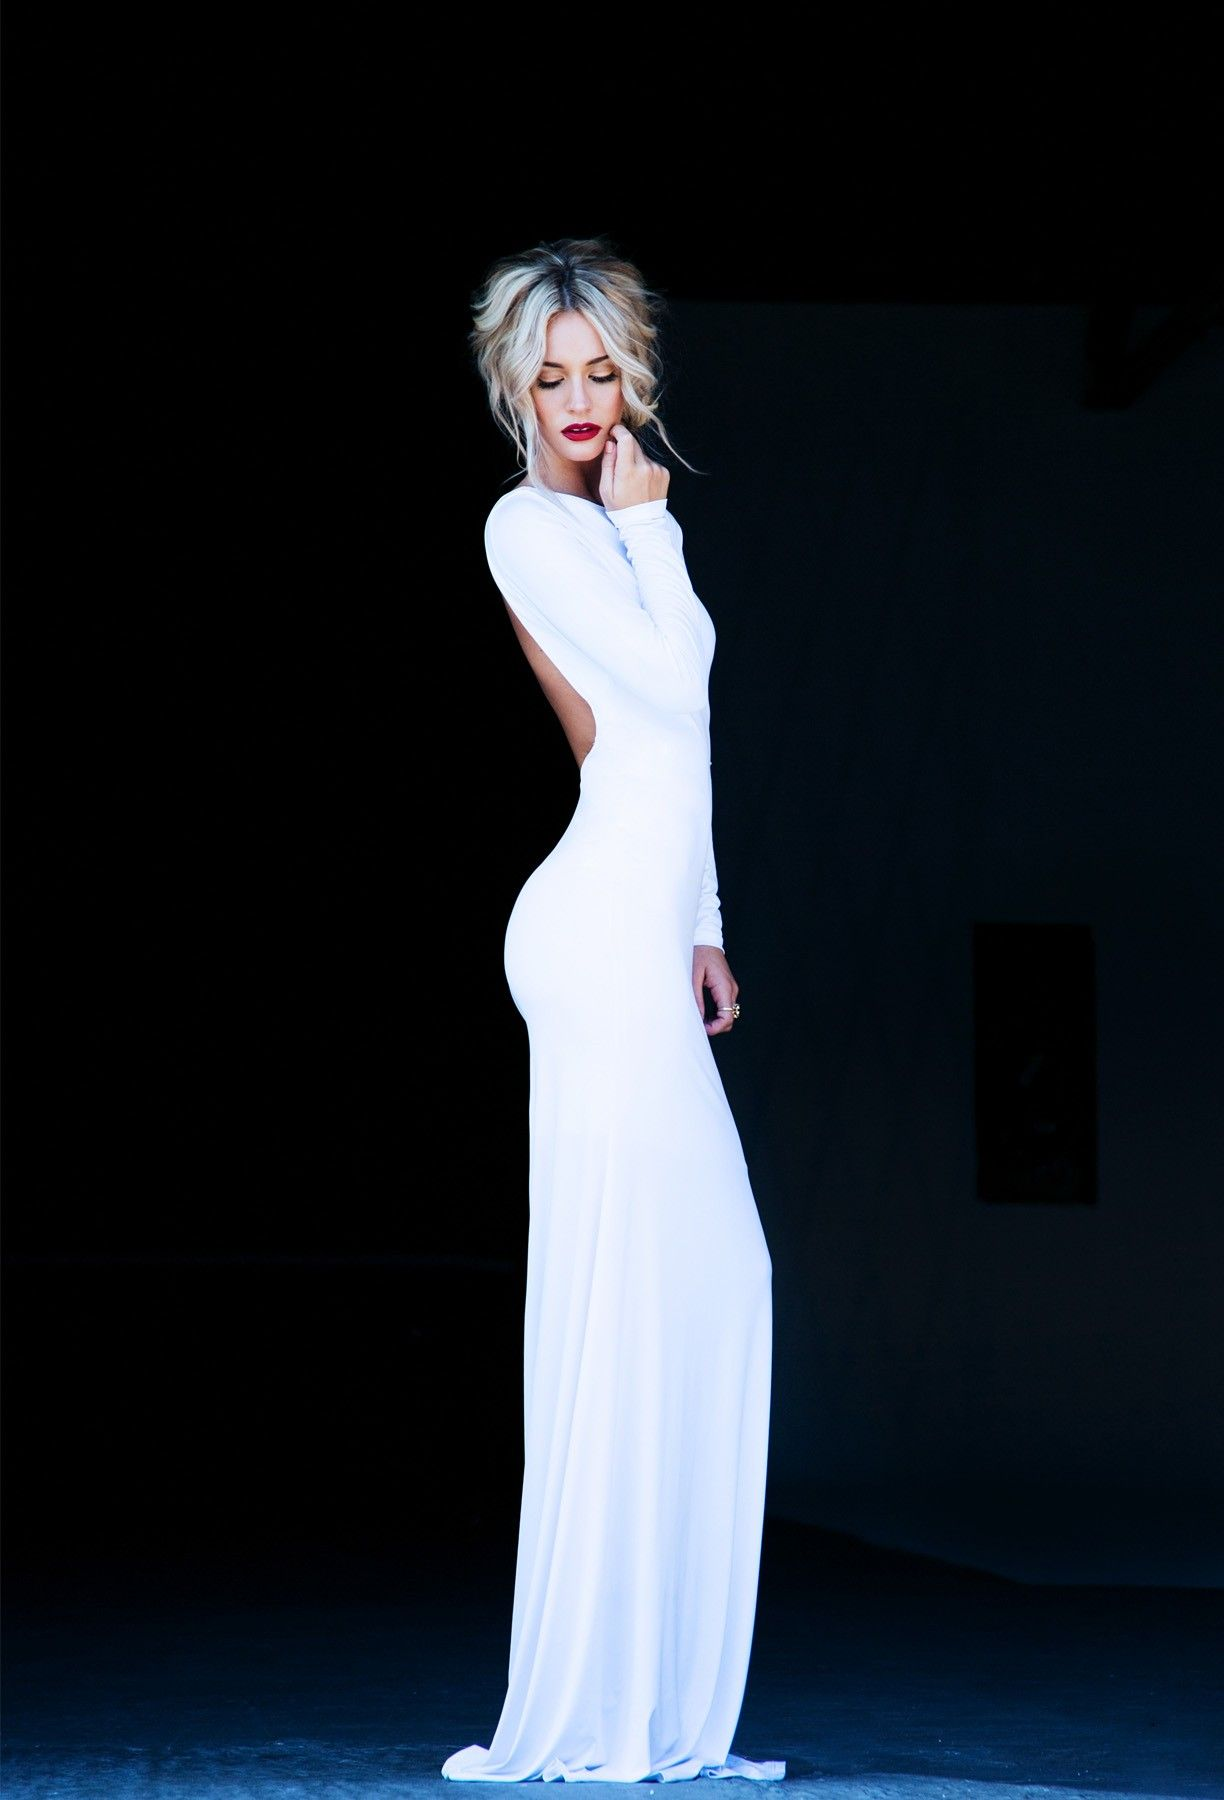 Pin by alexis thielman on fashion pinterest backless white